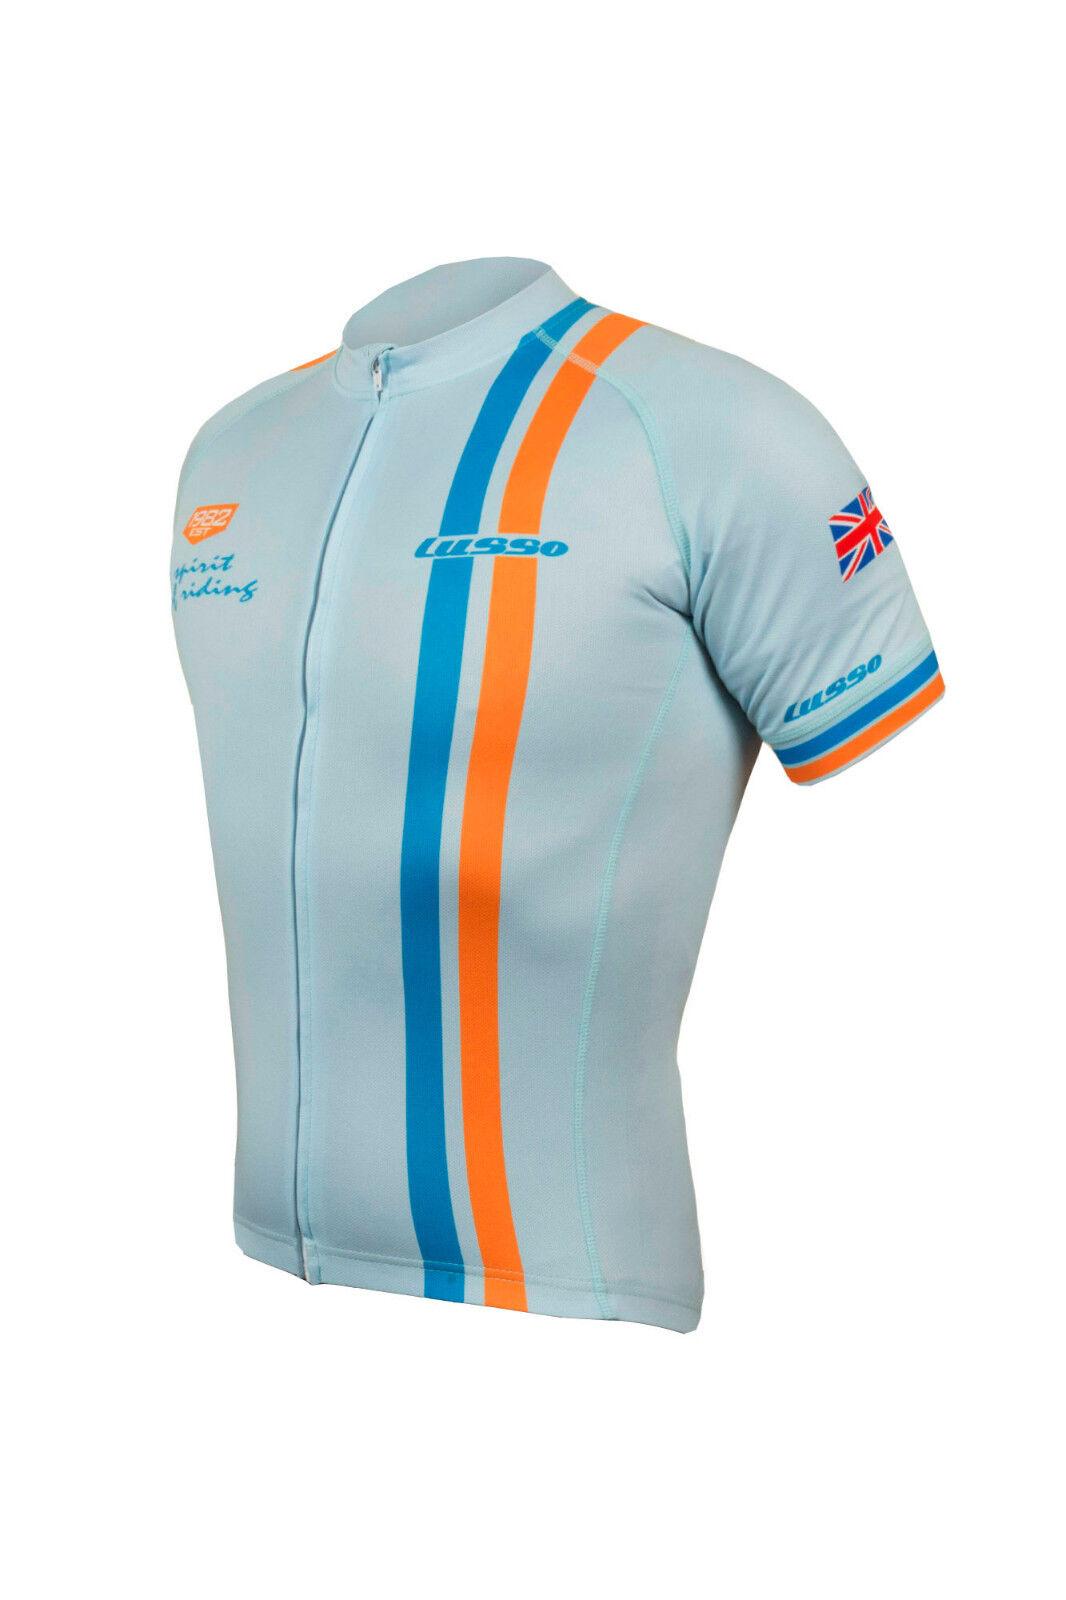 Lusso Men's LeMans Short Sleeve Cycling Jersey bluee S-XXL RRP .99